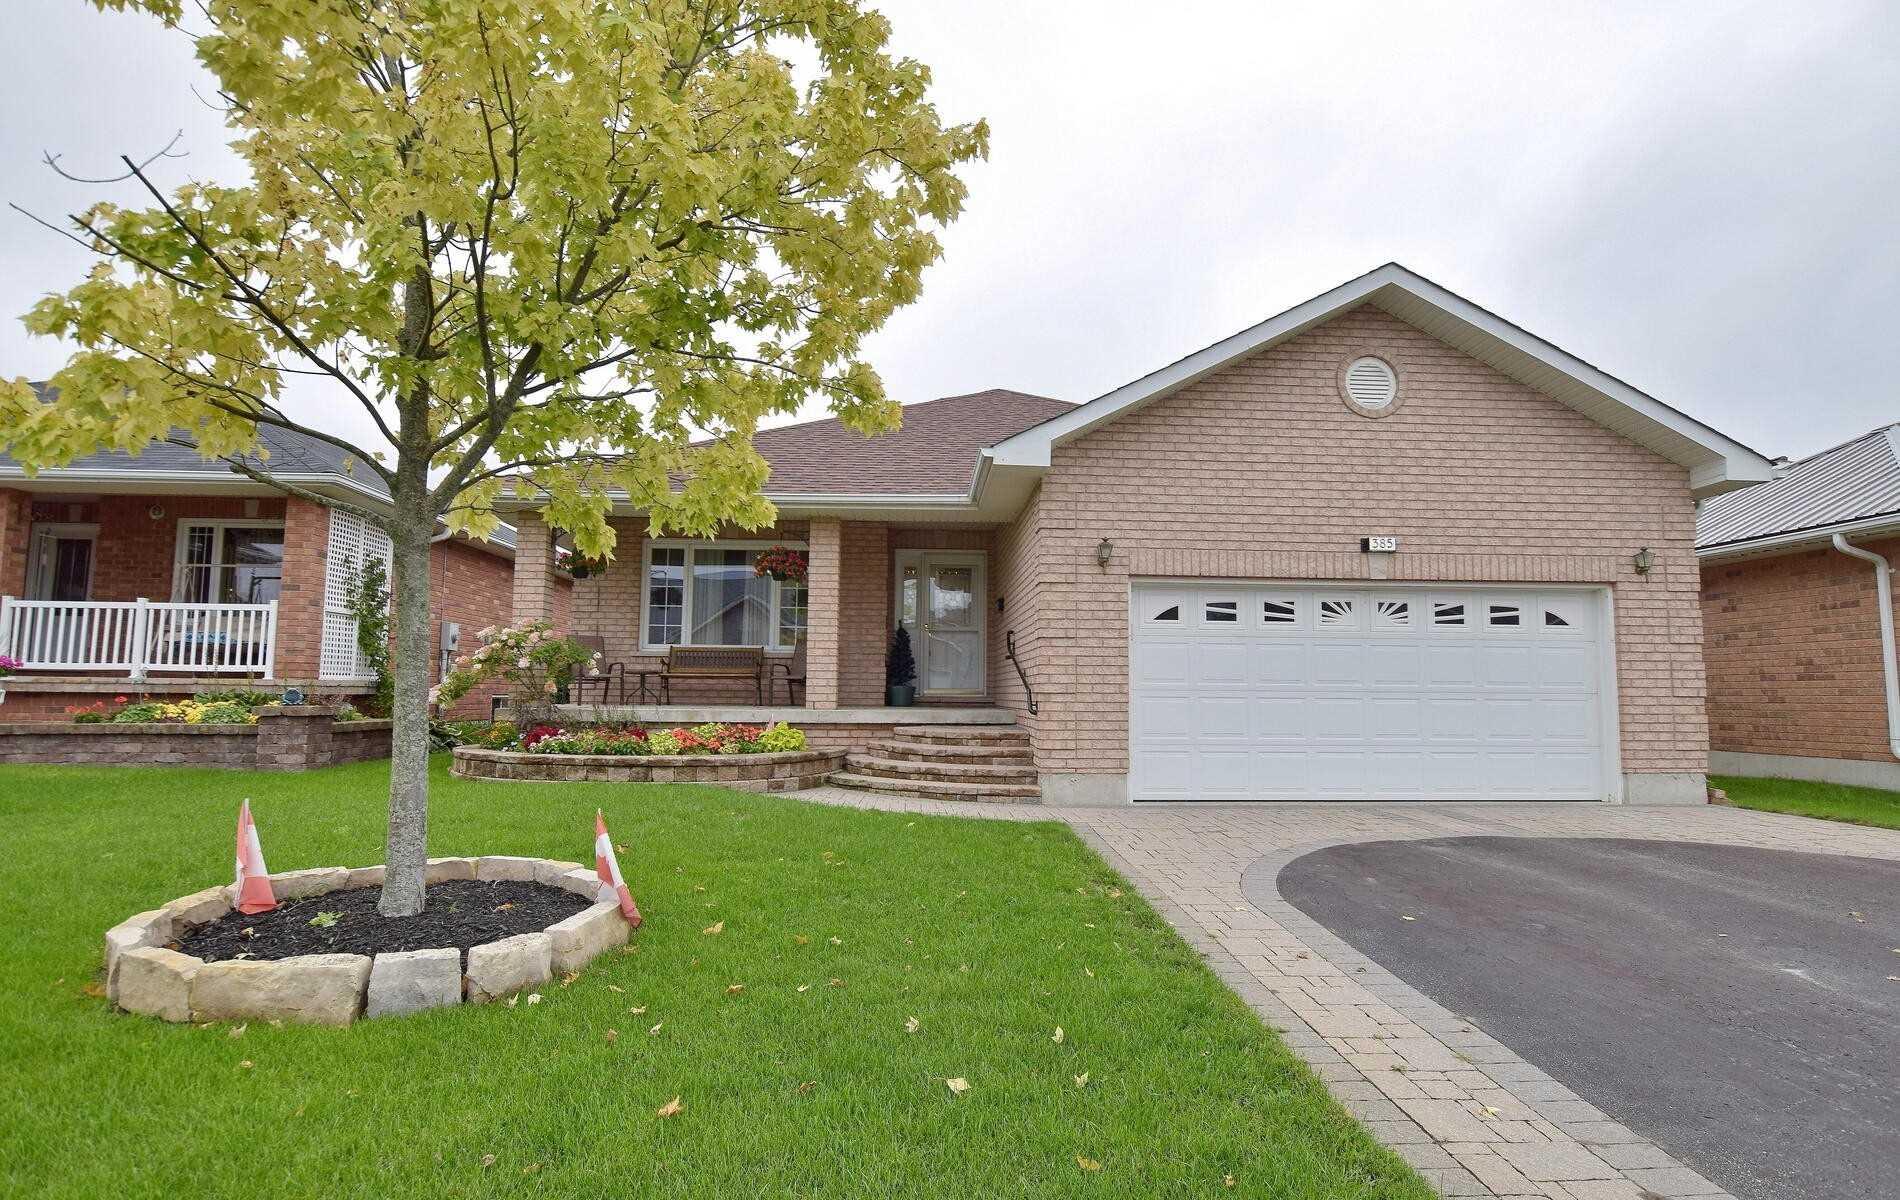 385 Wallace Dr, Kawartha Lakes, Ontario K9V 6K7, 2 Bedrooms Bedrooms, 5 Rooms Rooms,3 BathroomsBathrooms,Detached,For Sale,Wallace,X4906079